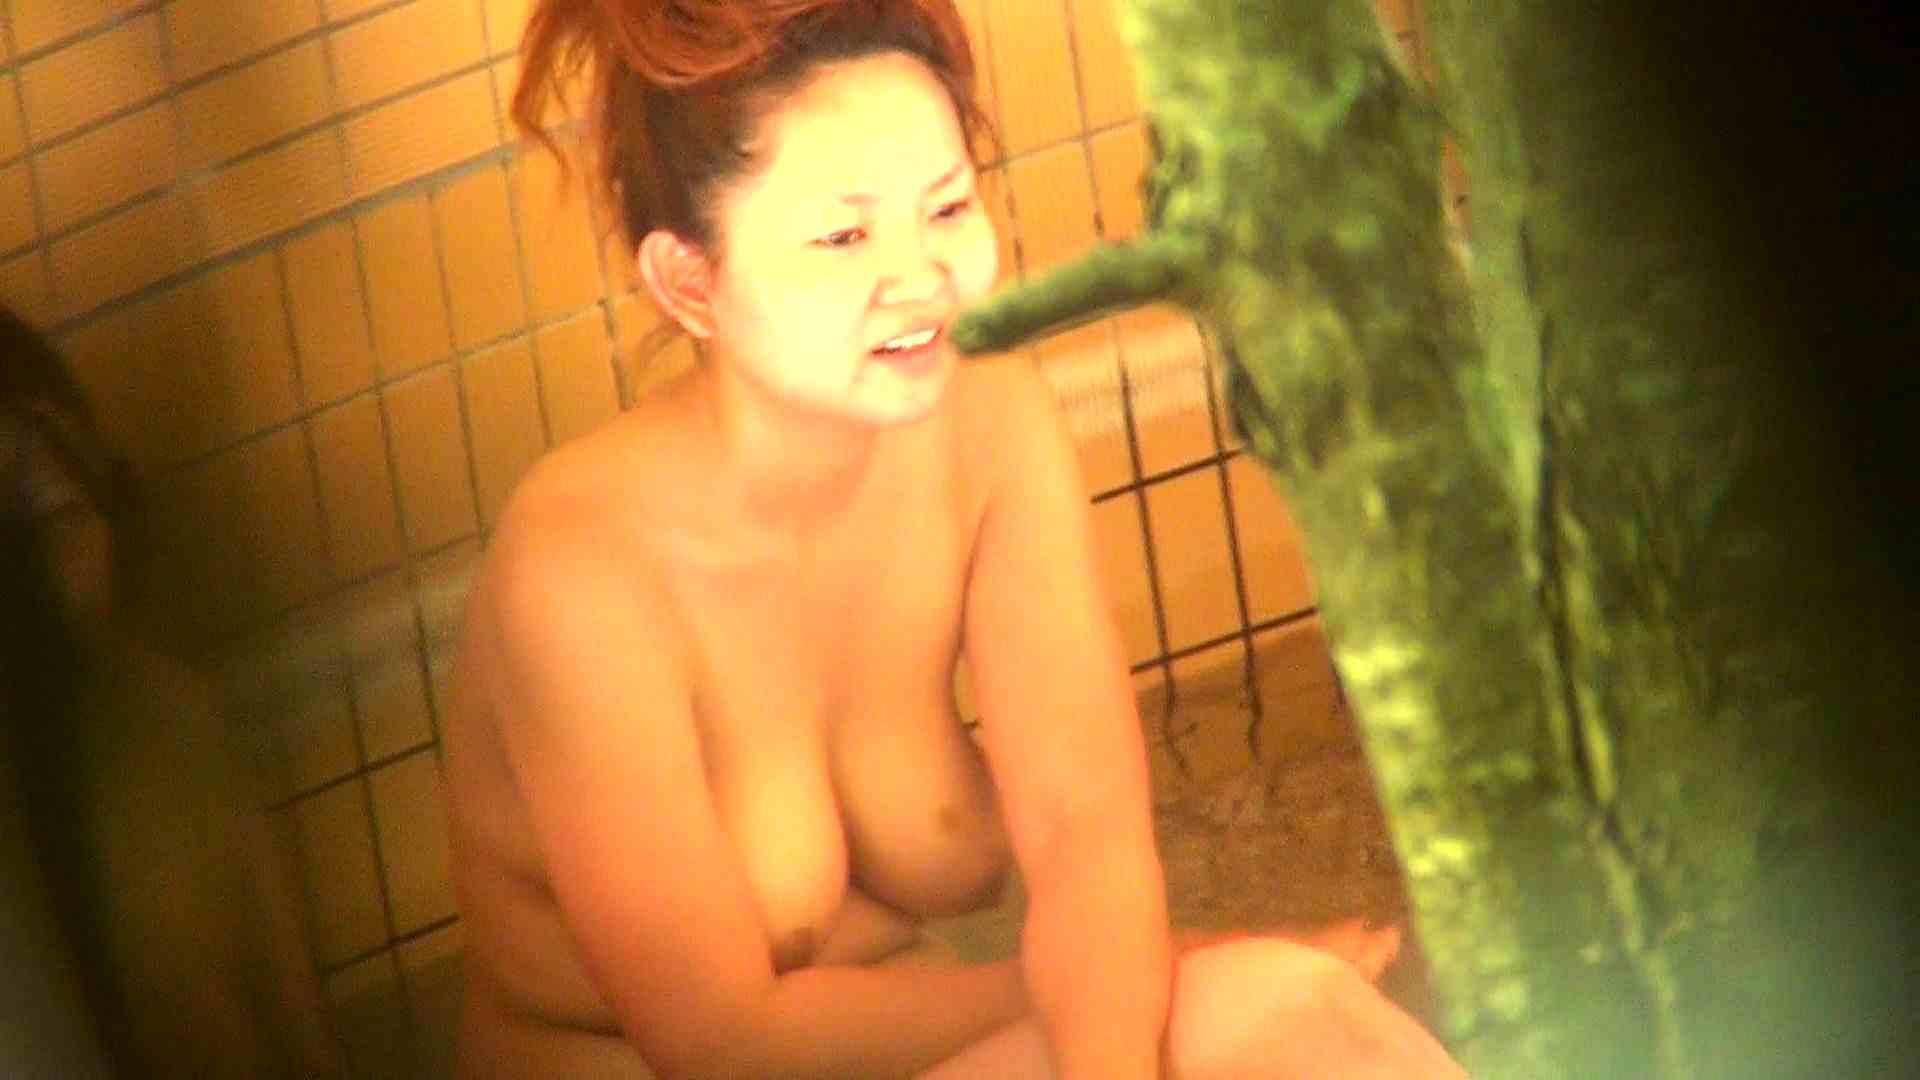 Vol.37 オデブと妊婦とokaasann 露天覗き オマンコ動画キャプチャ 94枚 86